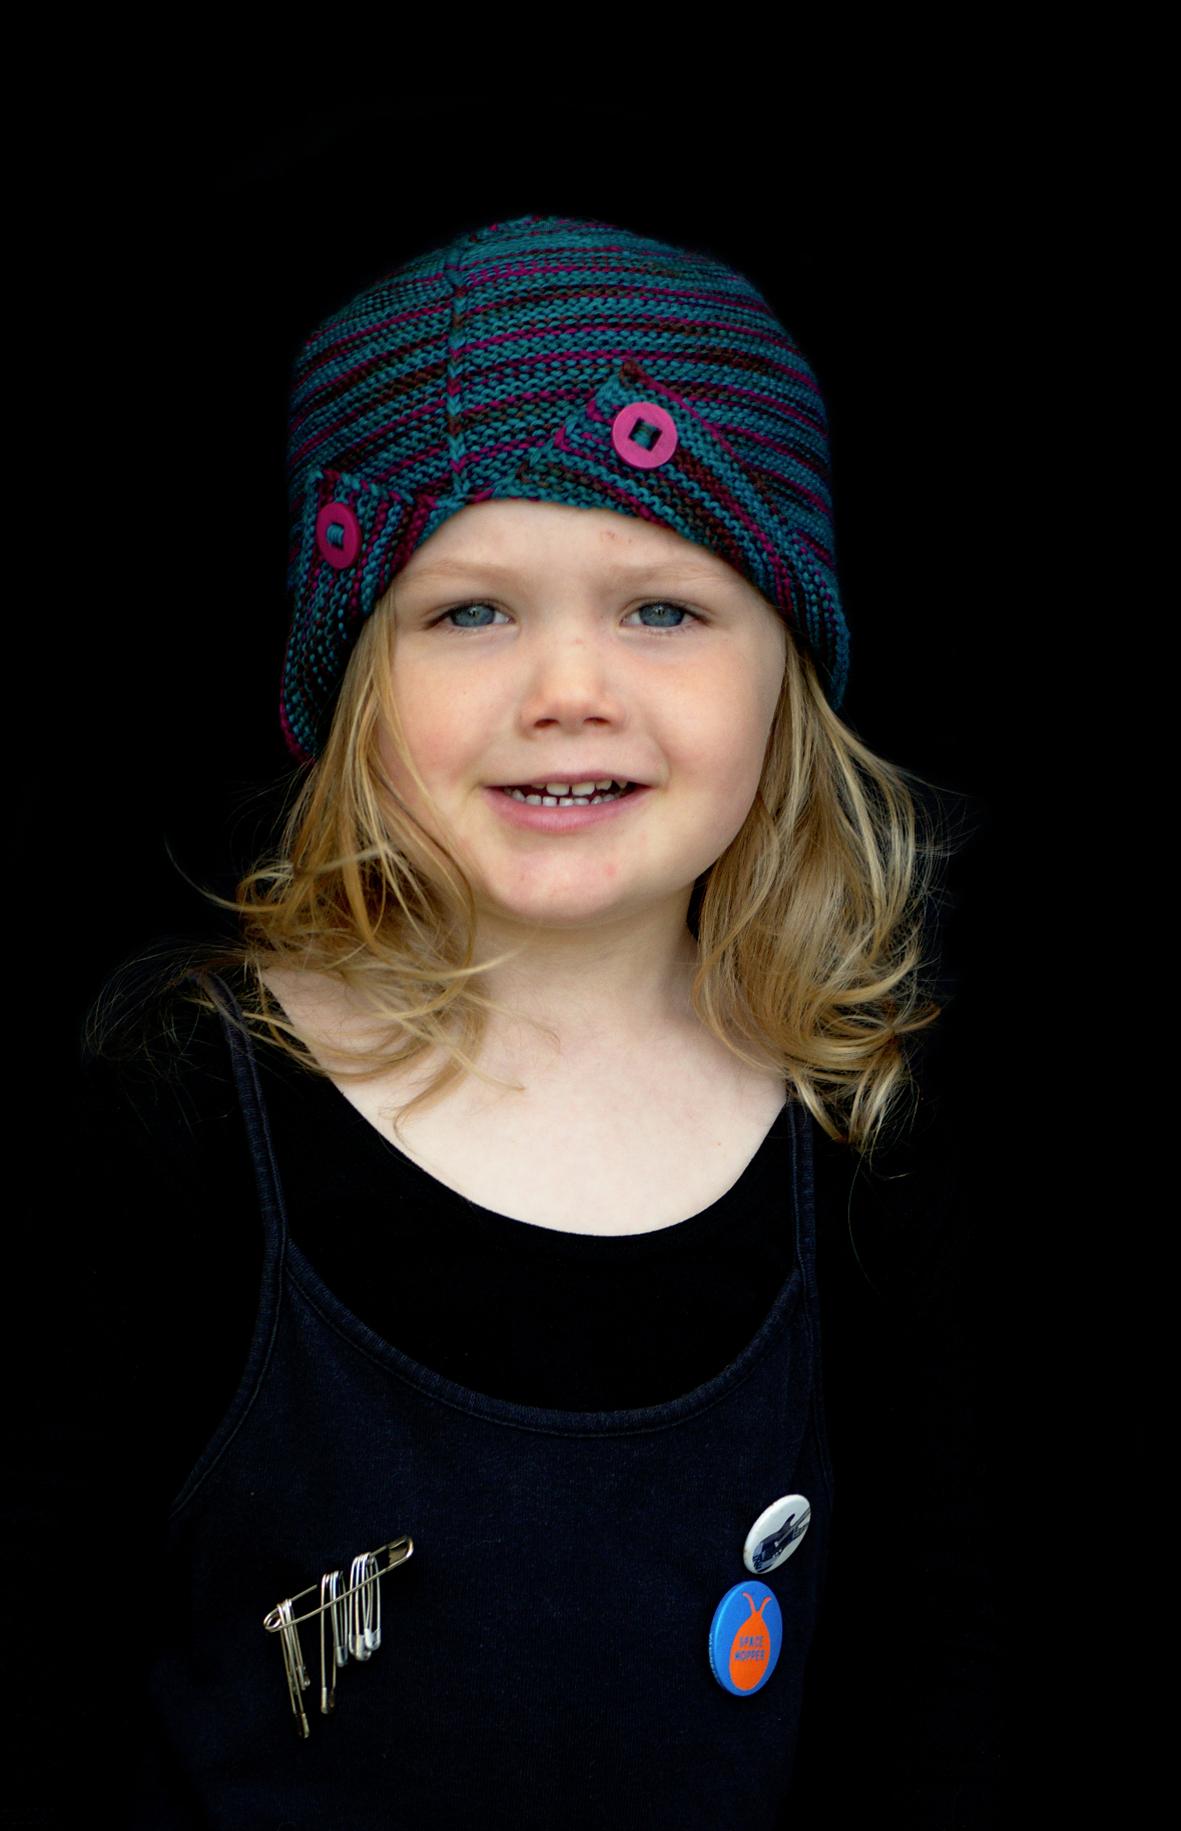 Wychavon cloche Hat knitting pattern for sock yarn